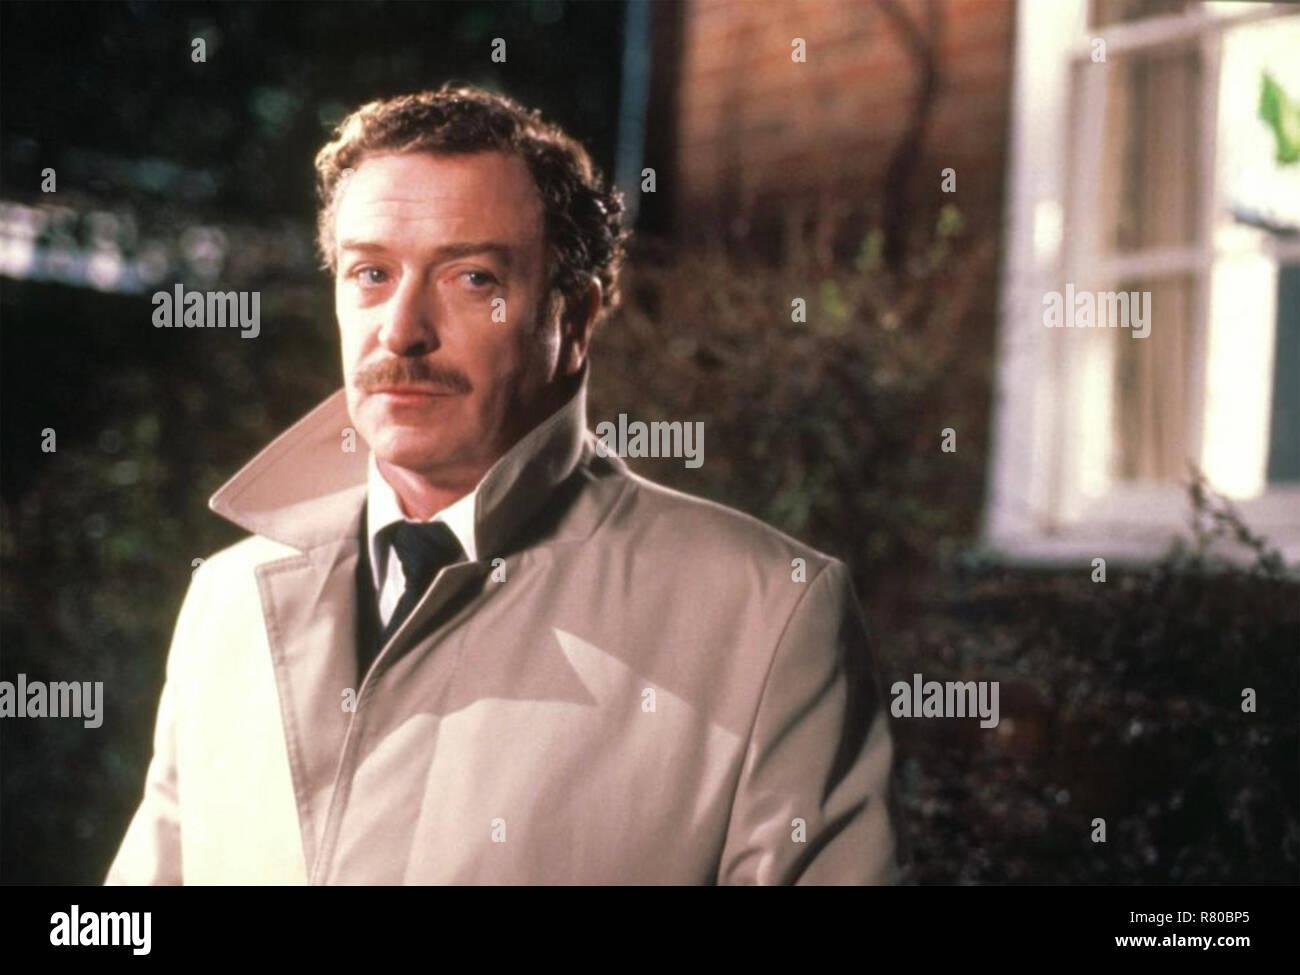 El hombre rompecabezas 1983 Evangrove film con Michael Caine Imagen De Stock